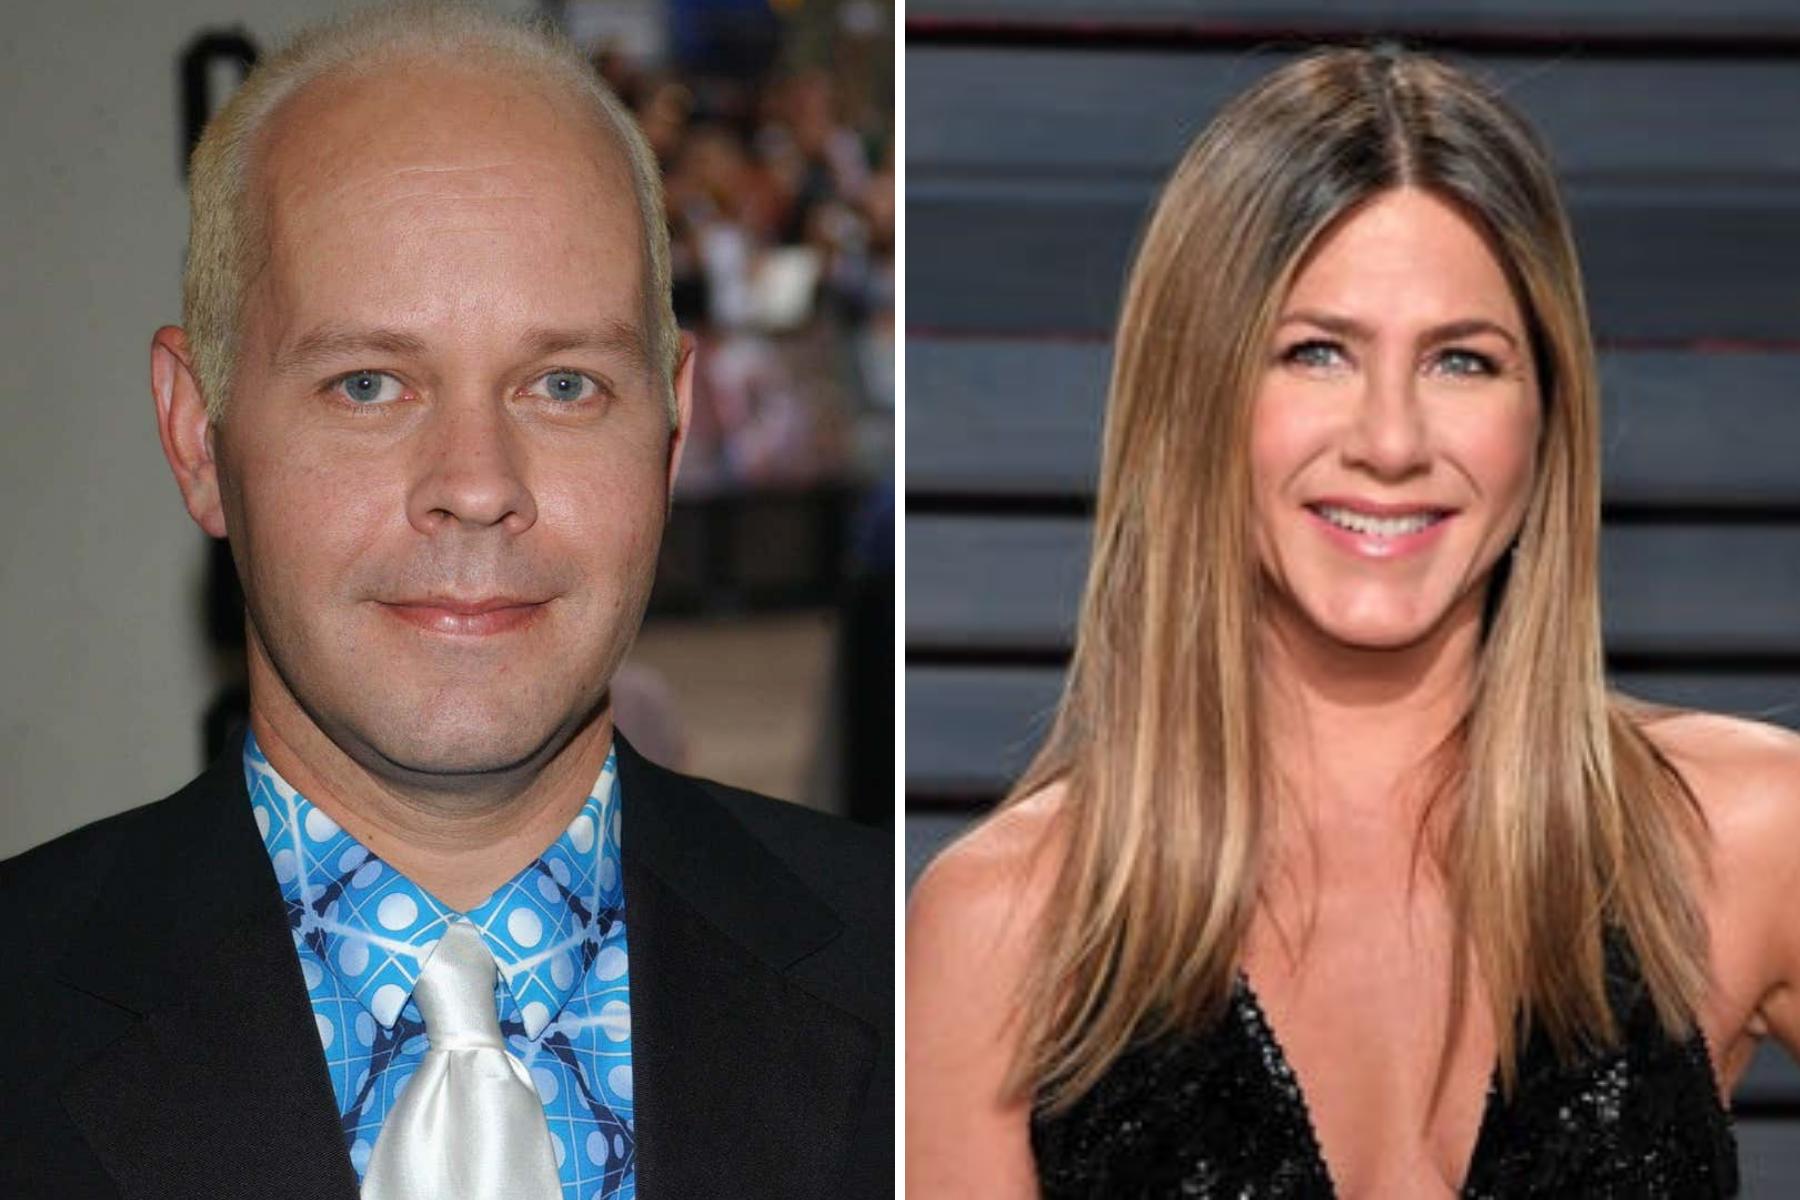 James Michael Tyler meninggal: Jennifer Aniston memimpin upeti dari pemeran Friends